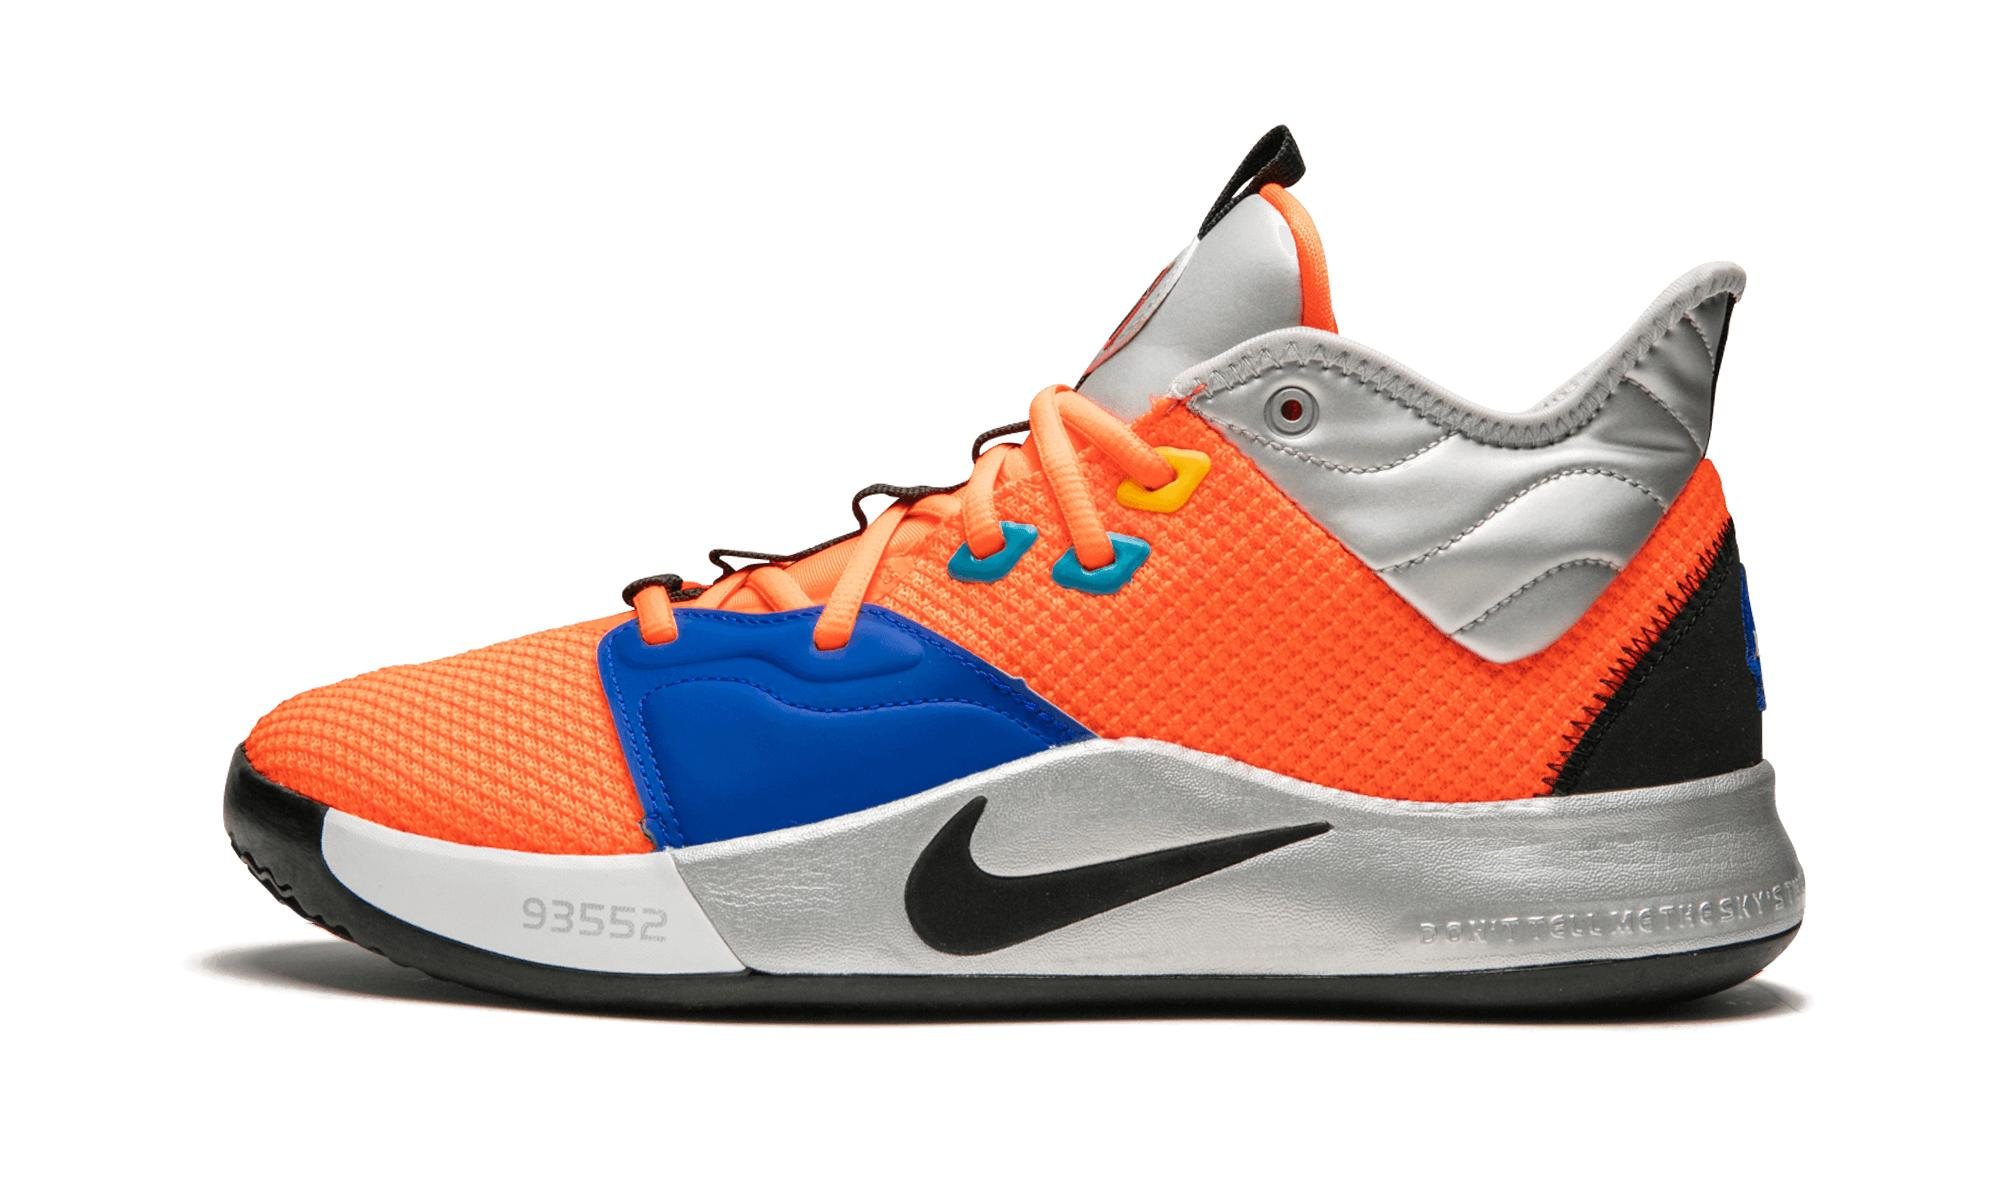 Lyst - Nike Pg 3 Special Box in Orange for Men 8951d02f8